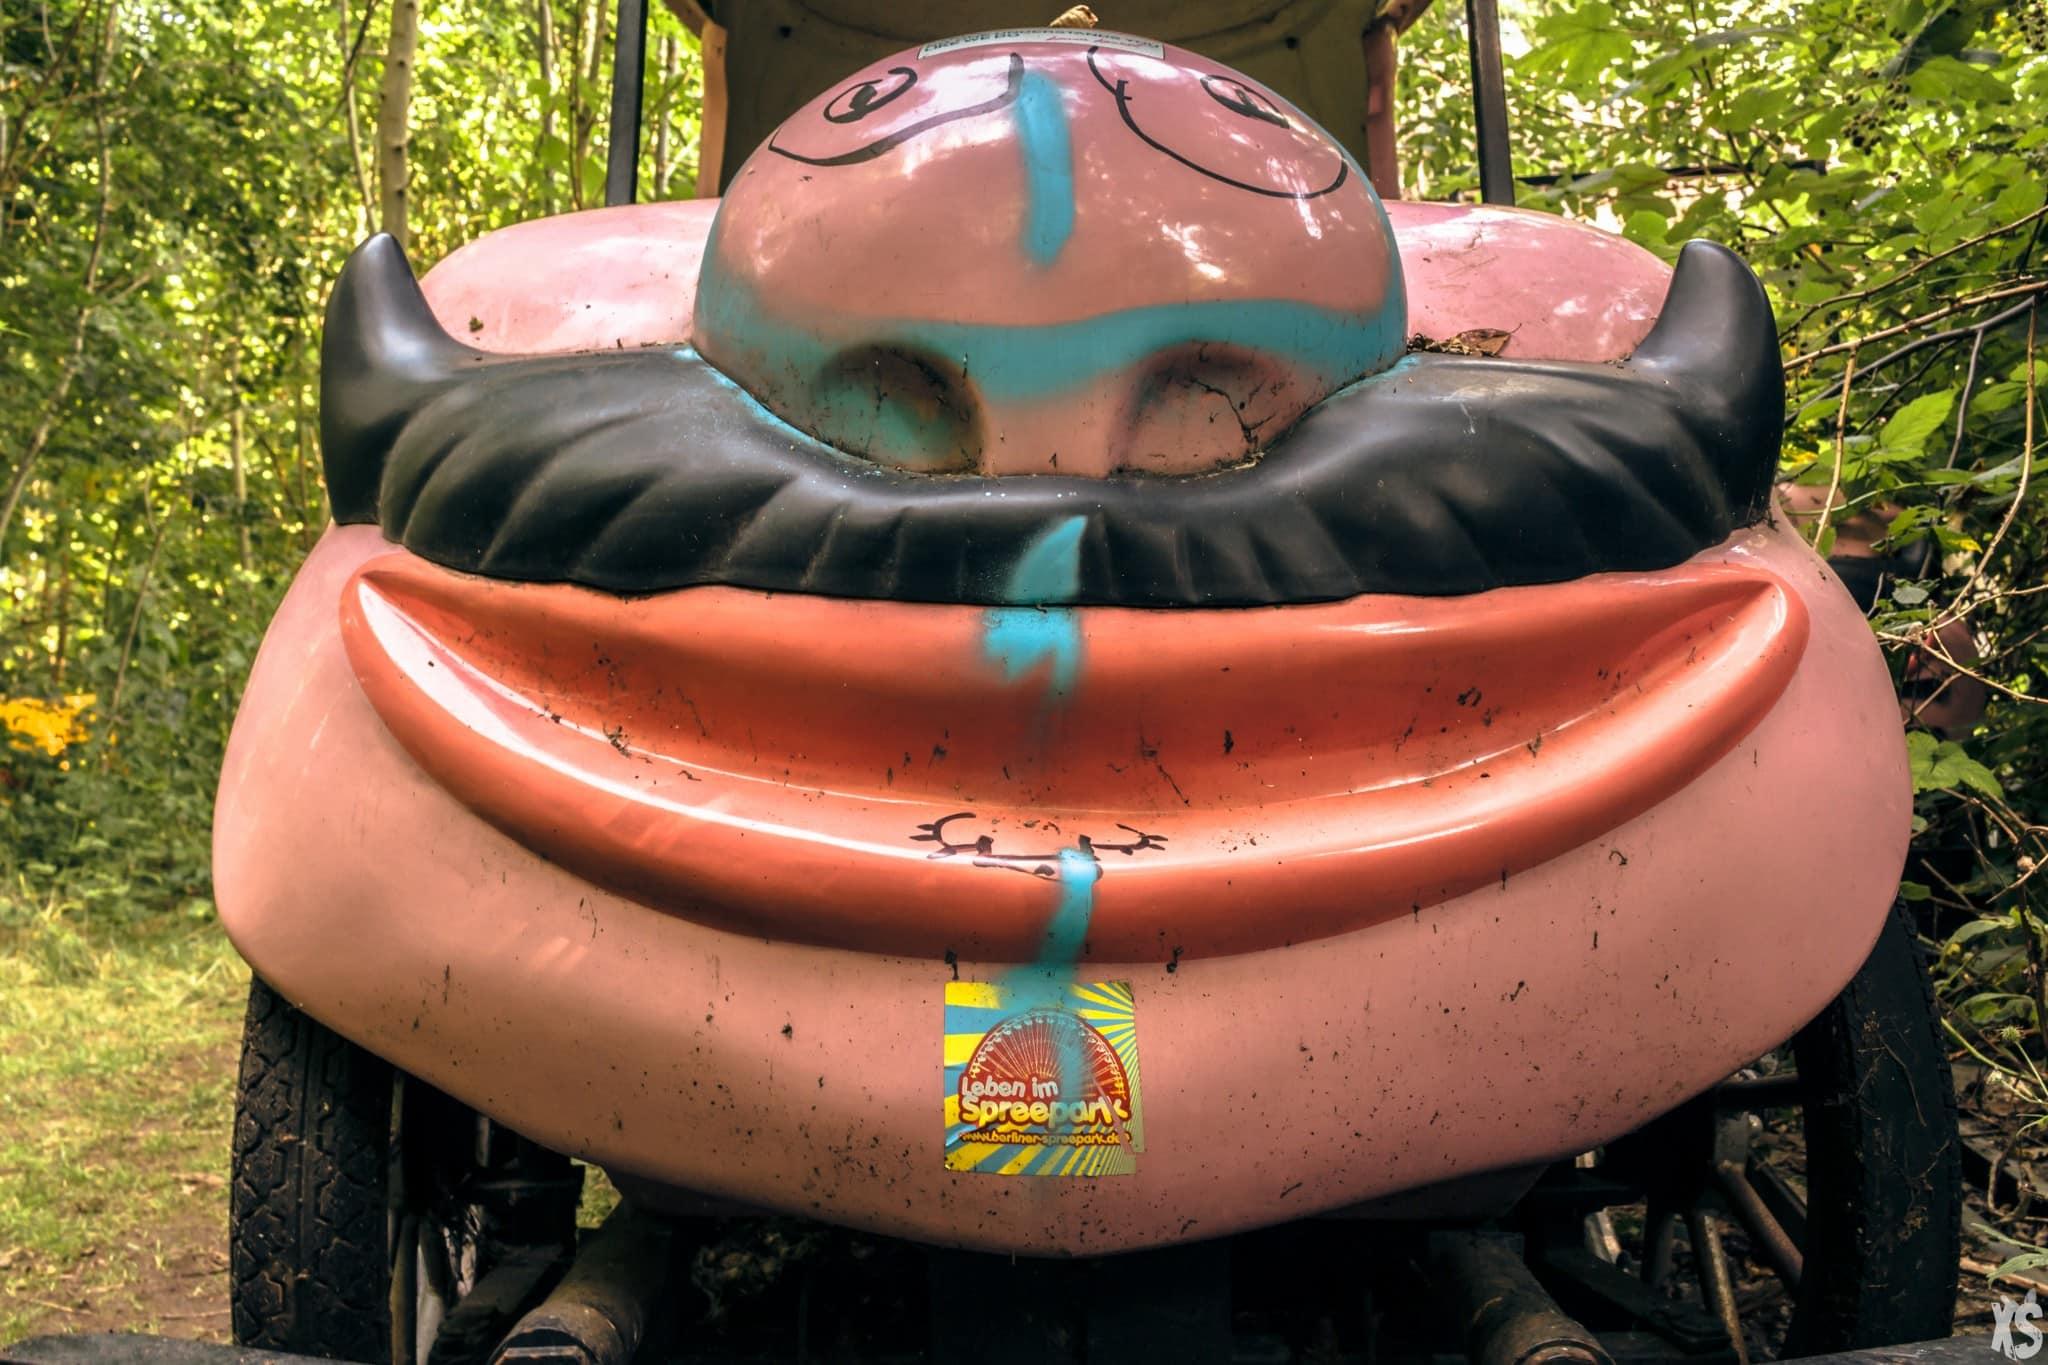 Spreepark, Abandoned Amusement Park in Germany | urbexsession.com/en/spreepark | Urbex Germany